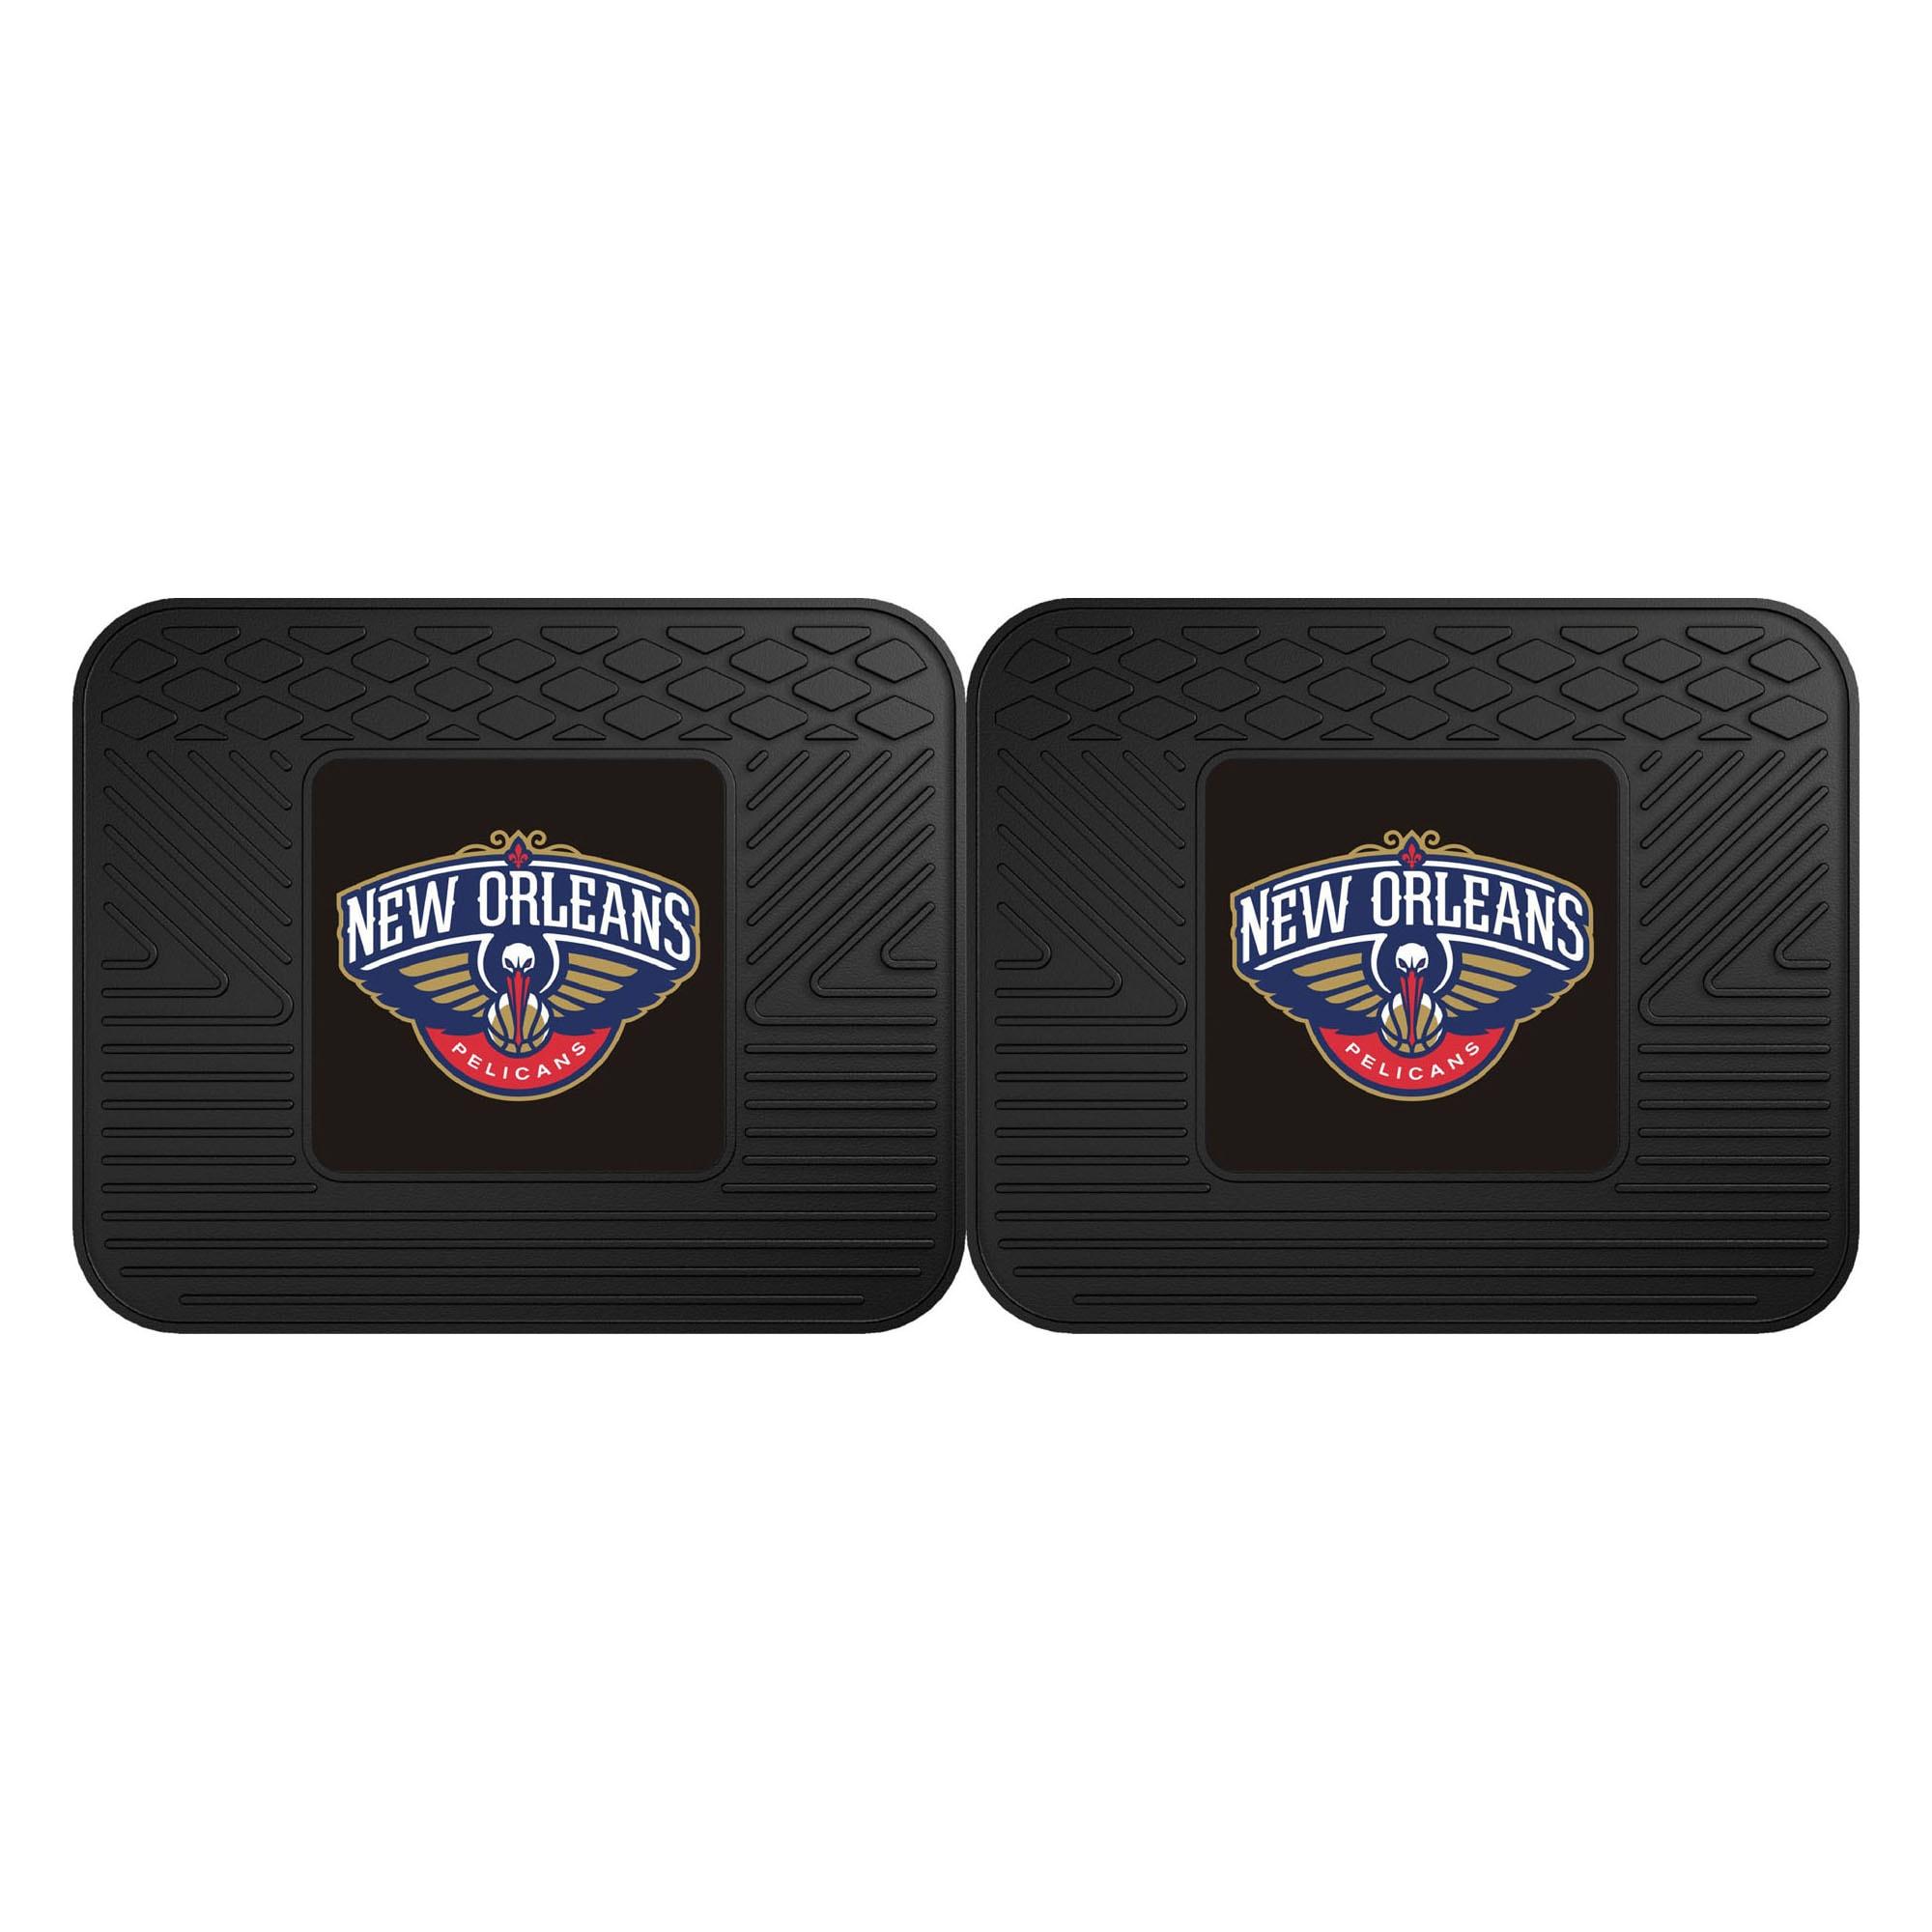 New Orleans Pelicans 2-Pack Utility Mat Set